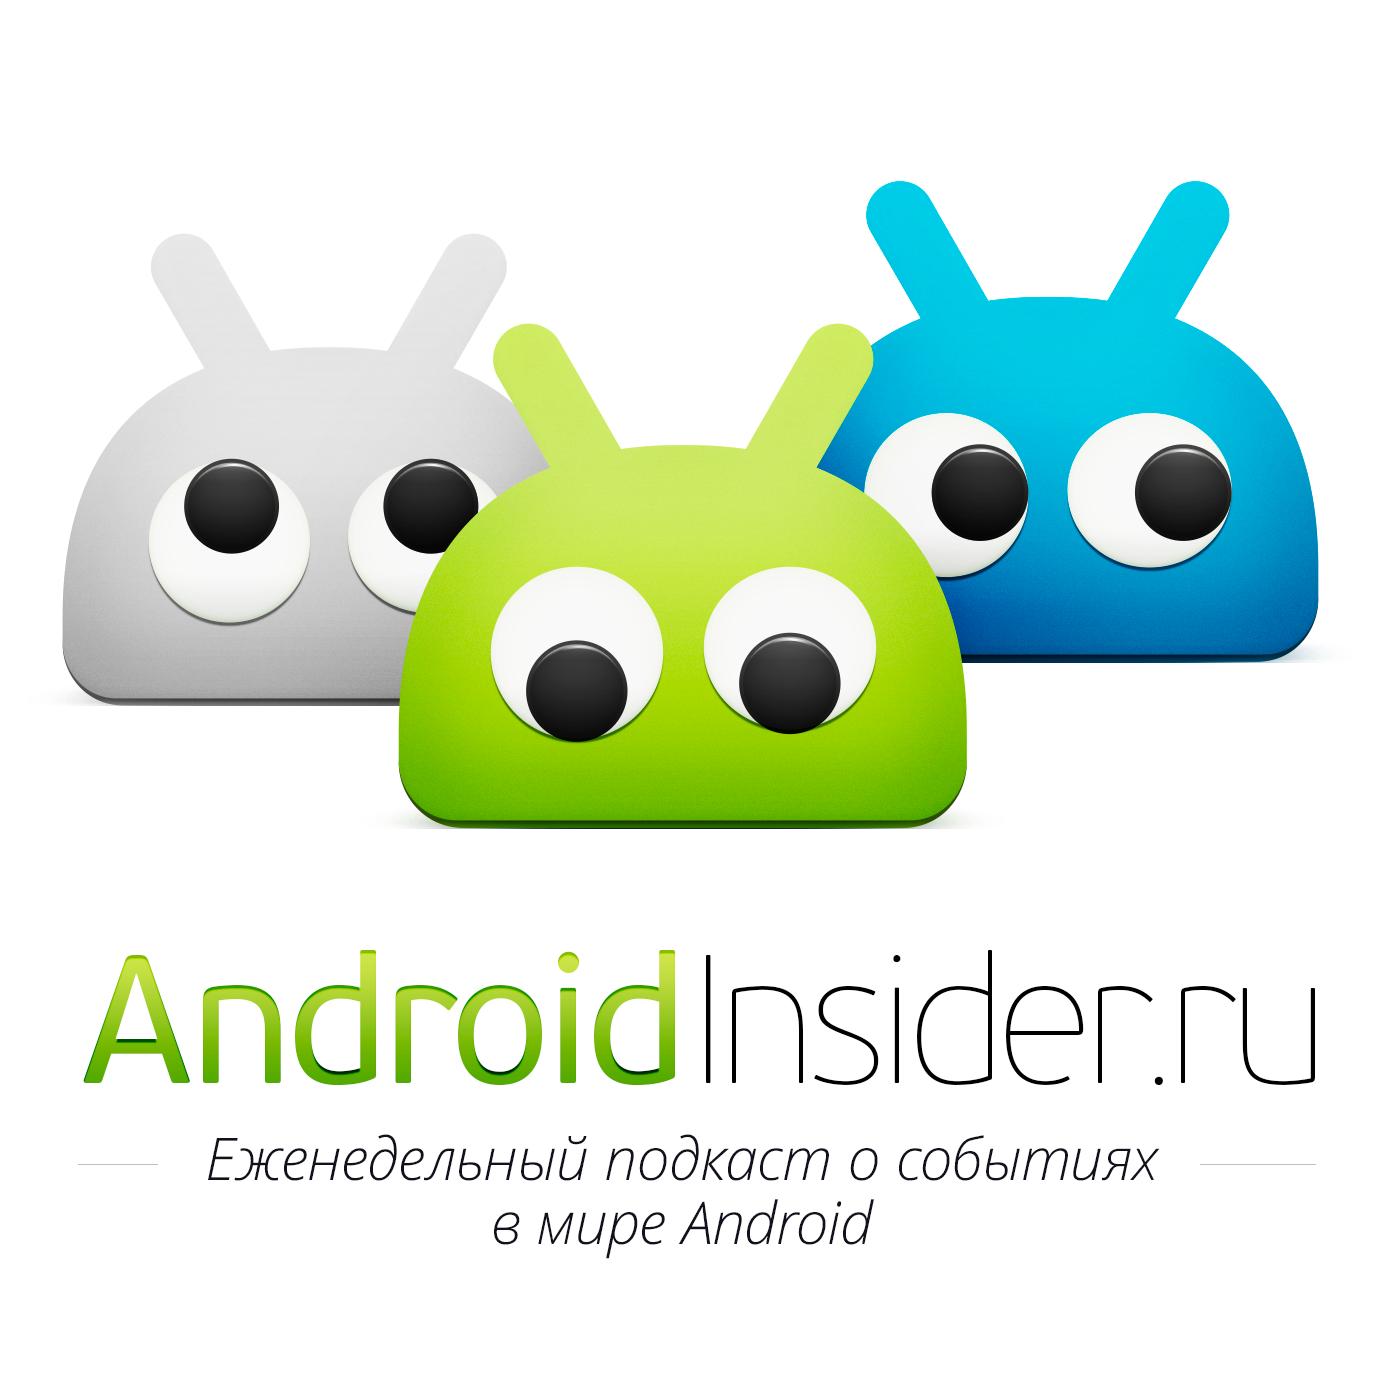 Илья Ильин Alcatel, Cyanogen и Microsoft tanix tx8 mini android 6 0 marshmallow amlogic s912 tv box